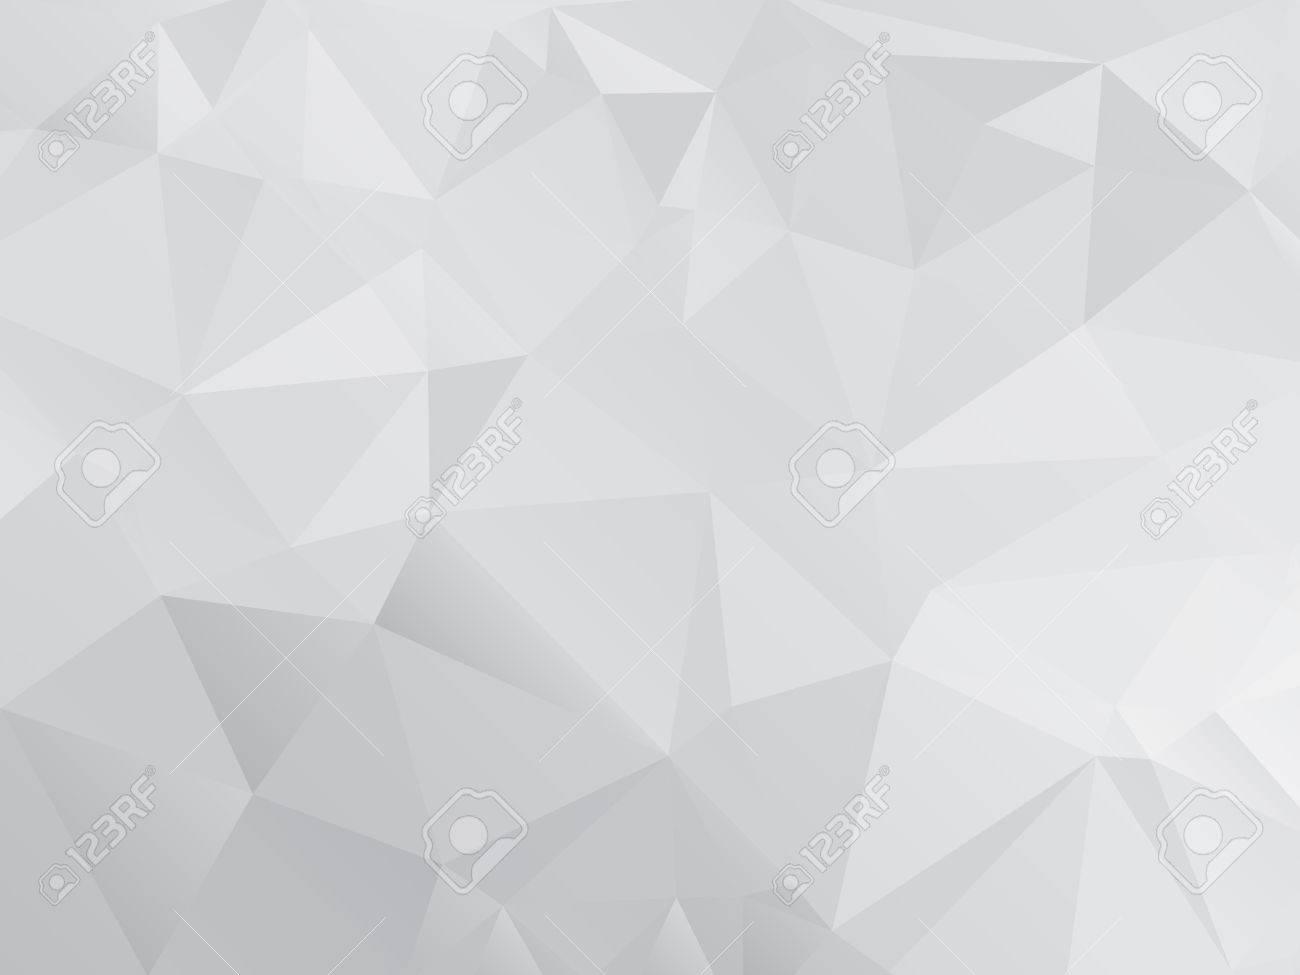 Gray Polygonal Mosaic Paper Background, Vector illustration - 37457528